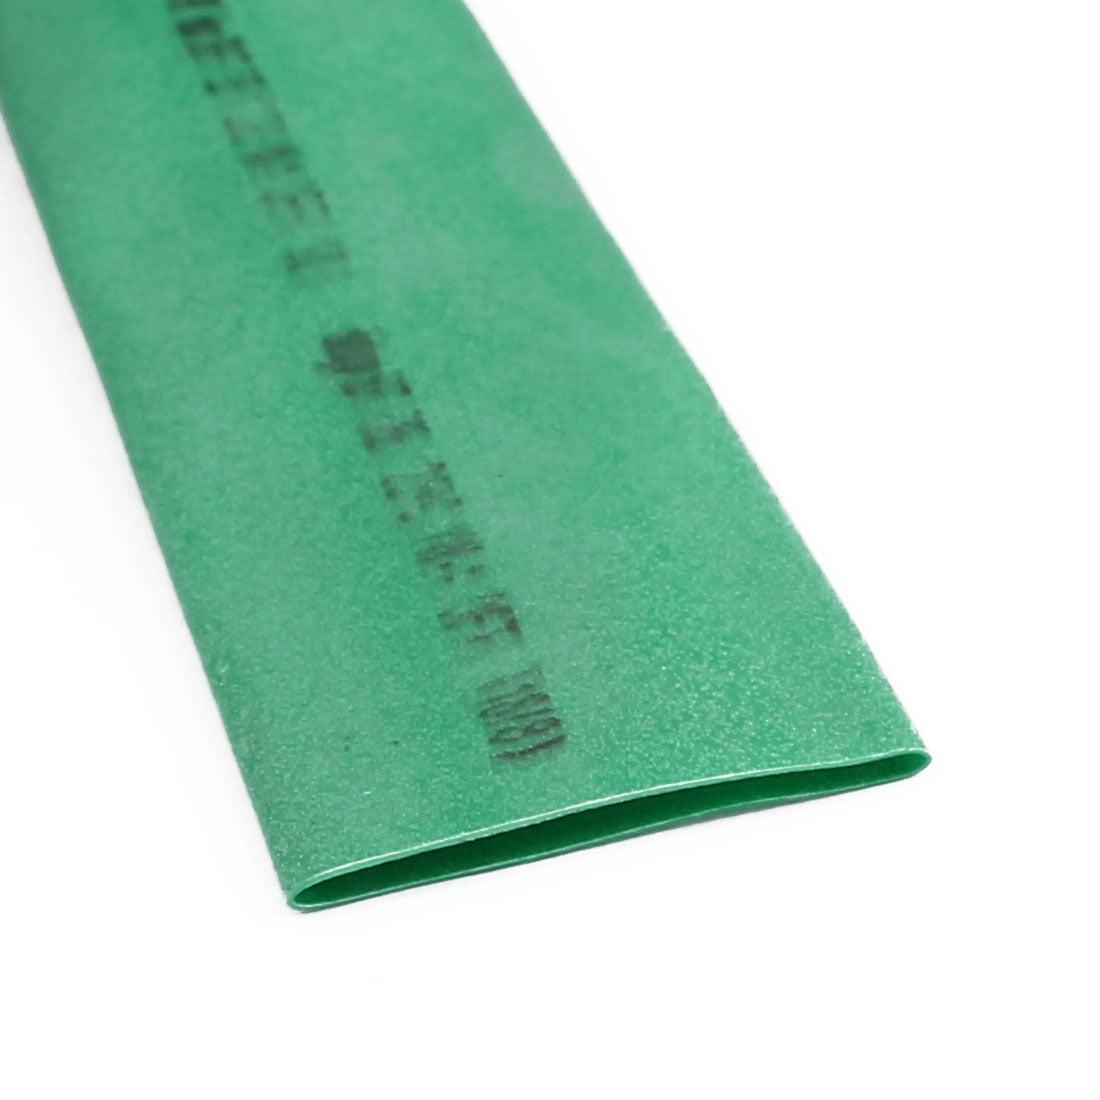 4.5M Length 16mm Dia Polyolefin Heat Shrinkable Tube Sleeving Green - image 2 of 3